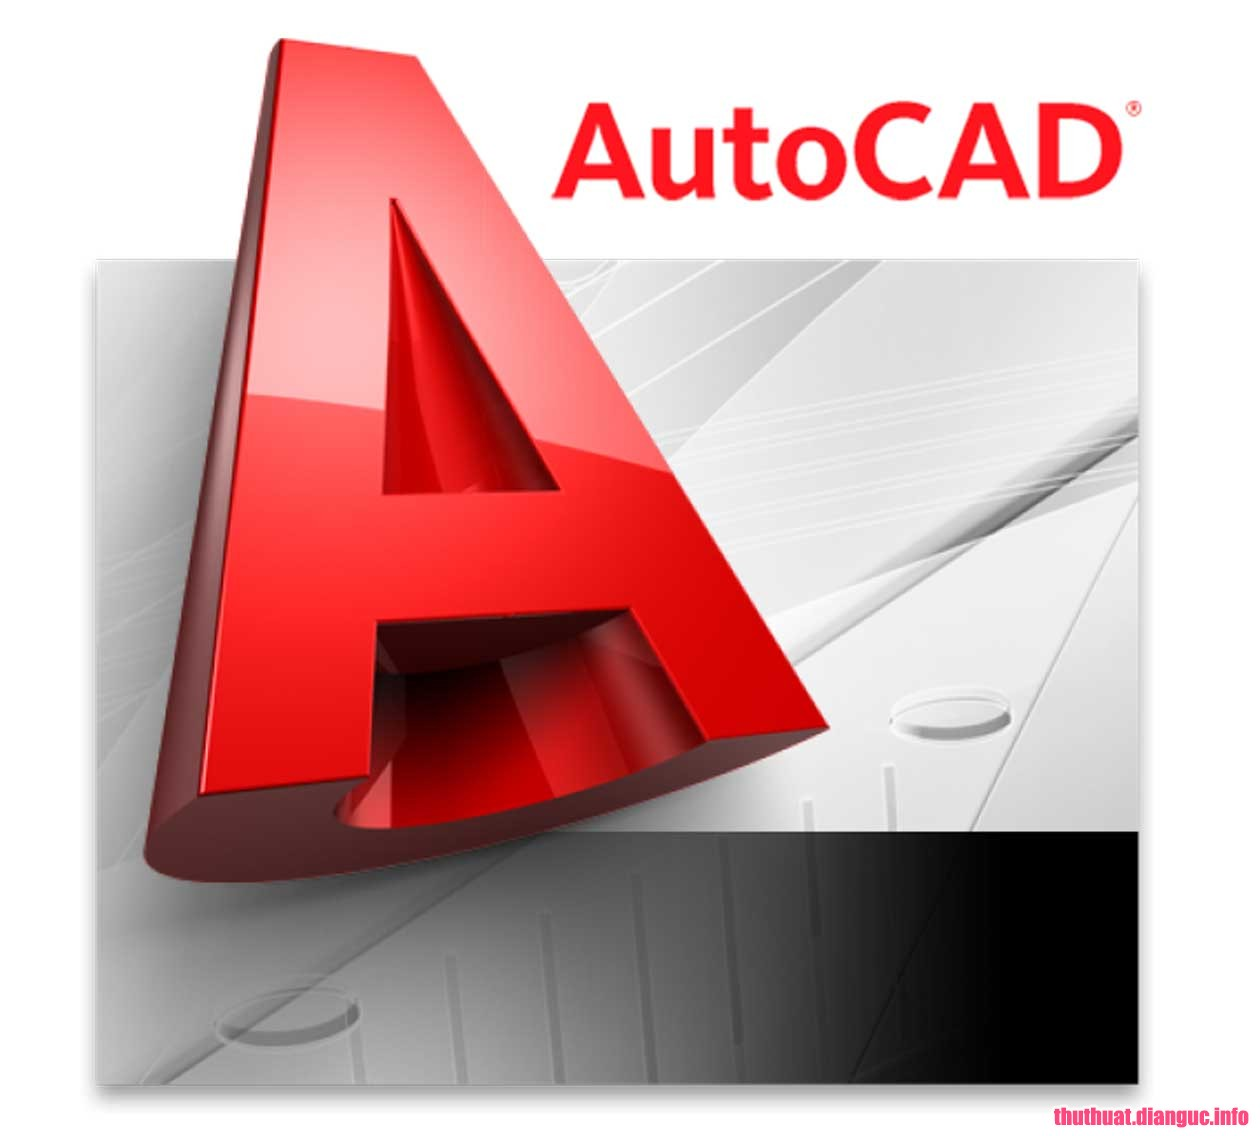 tie-smallTổng hợp phần mềm AutoCAD tất cả các phiên bản full activate